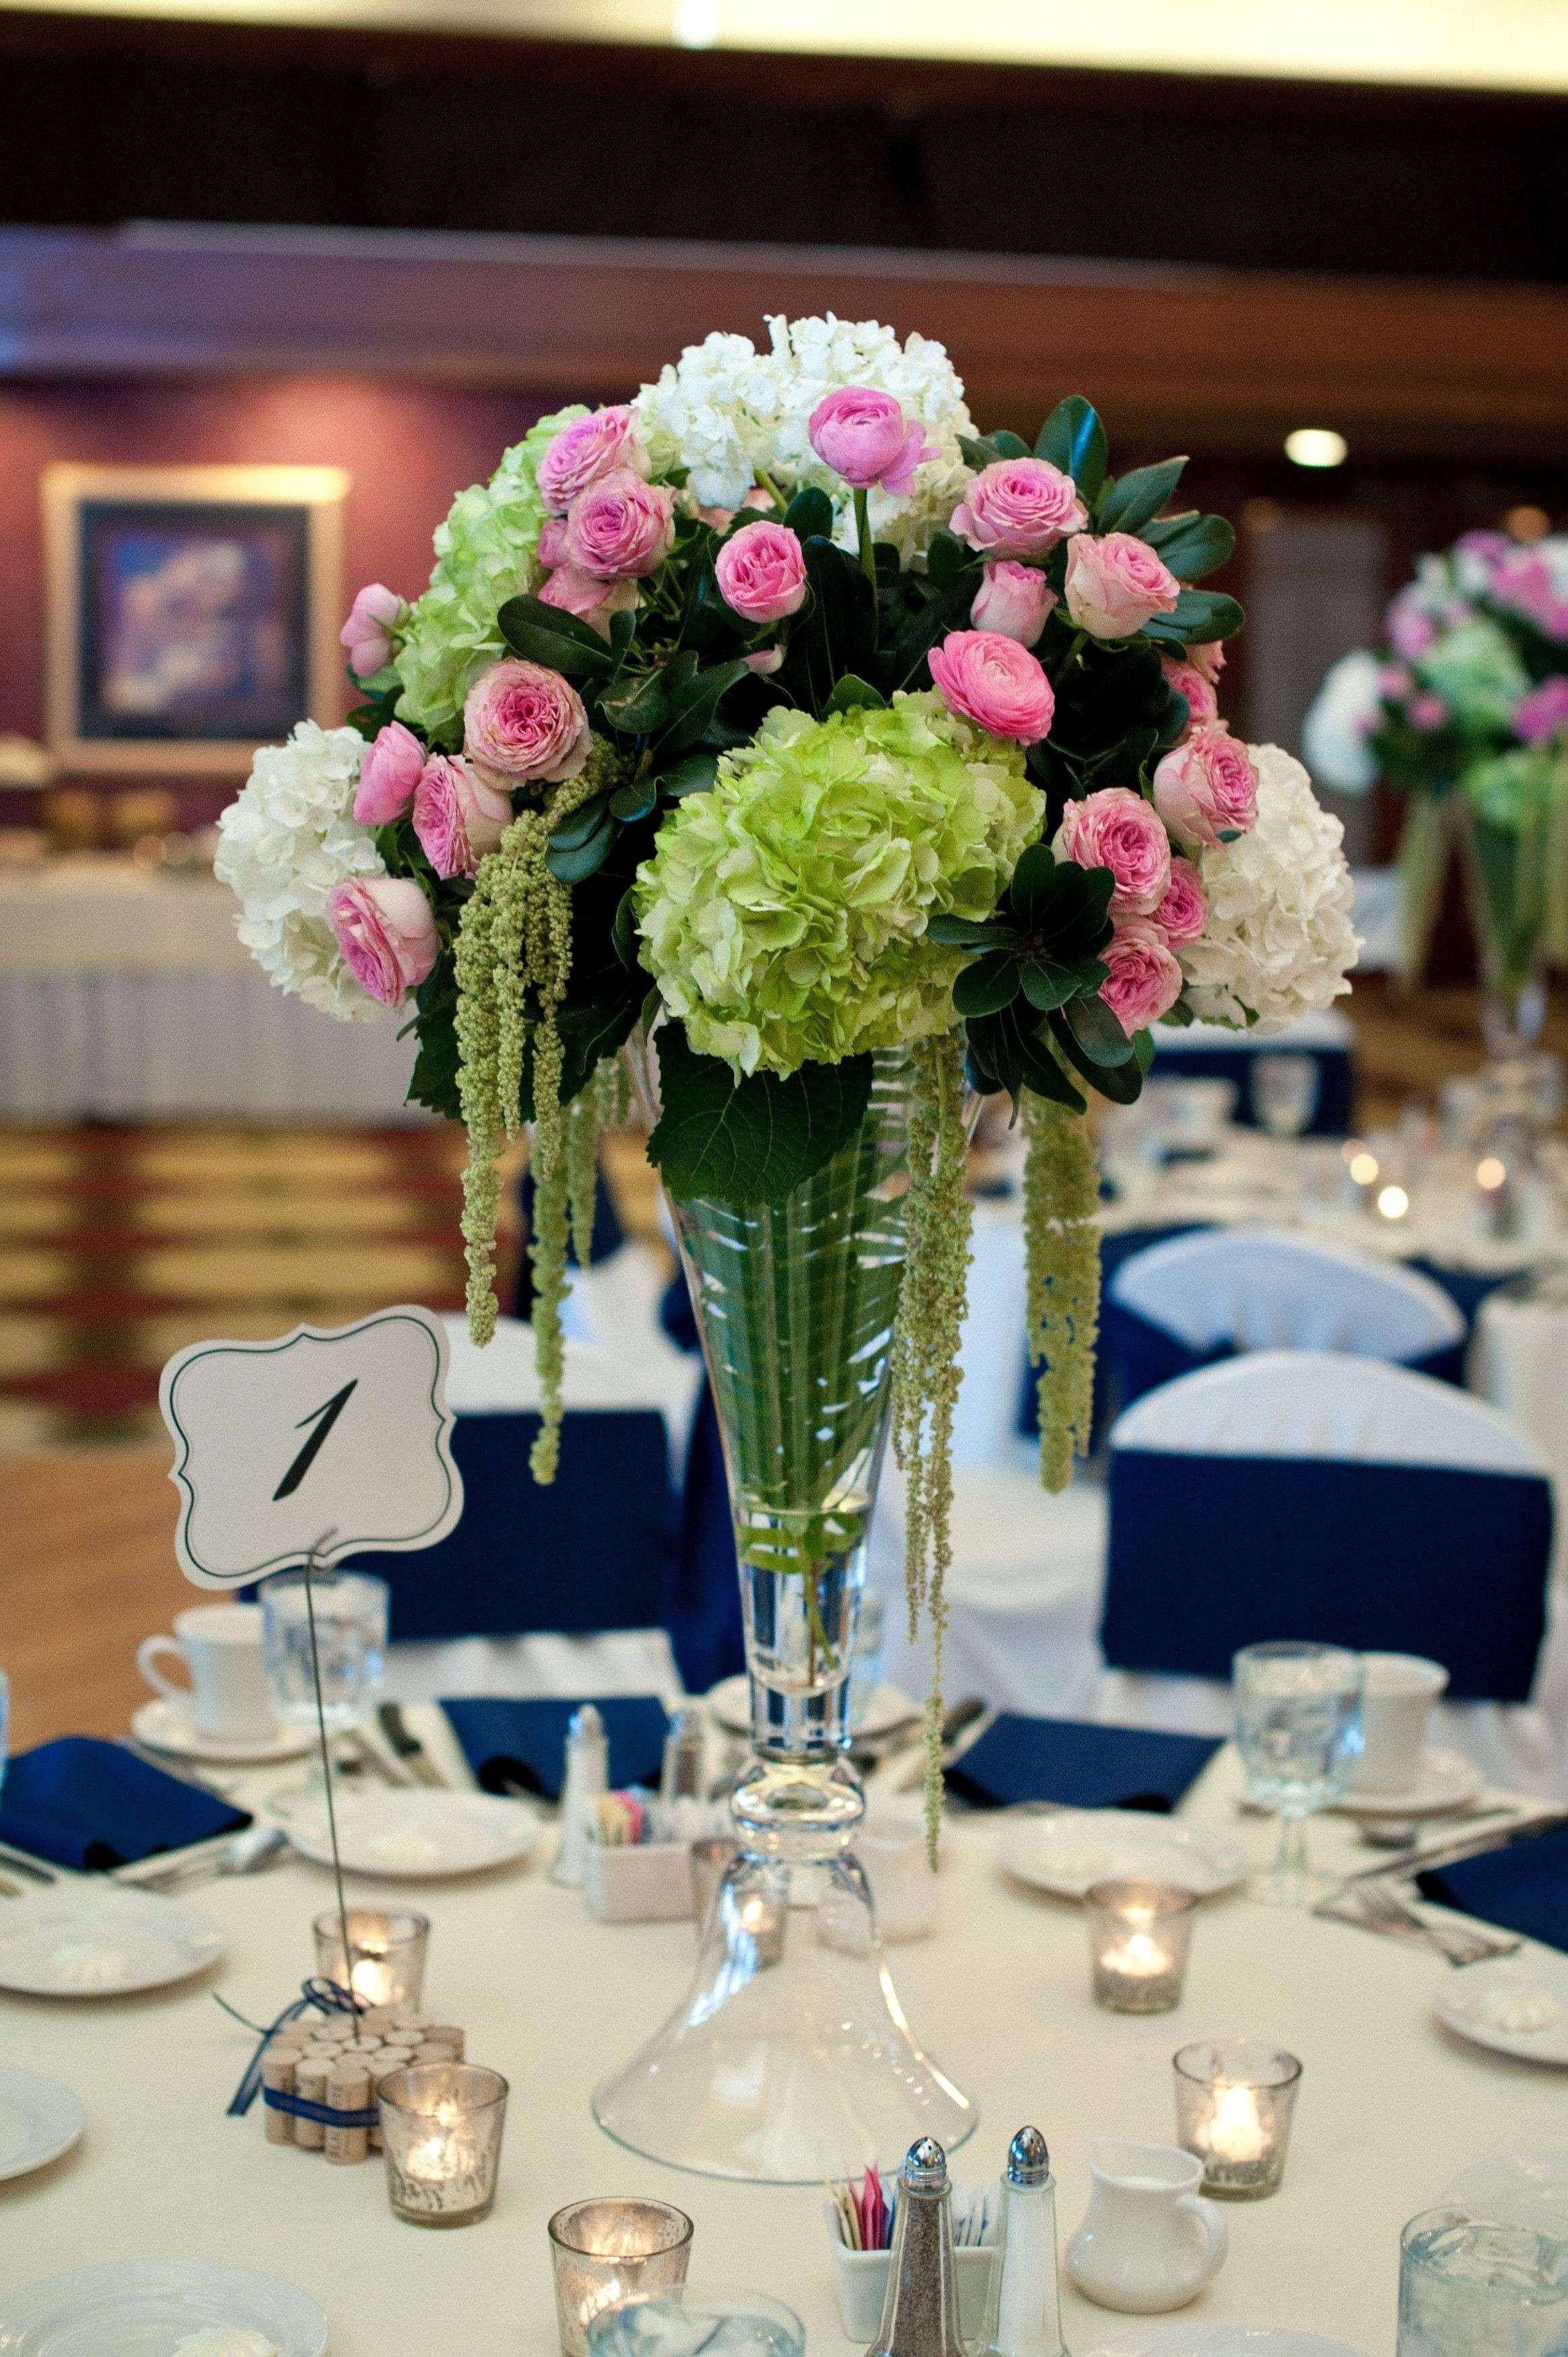 silver flower vases weddings of unique of diy wedding decorations photograph artsvisuelscaribeens in top result diy engagement ts best wedding diy wedding decorations unique wedding d